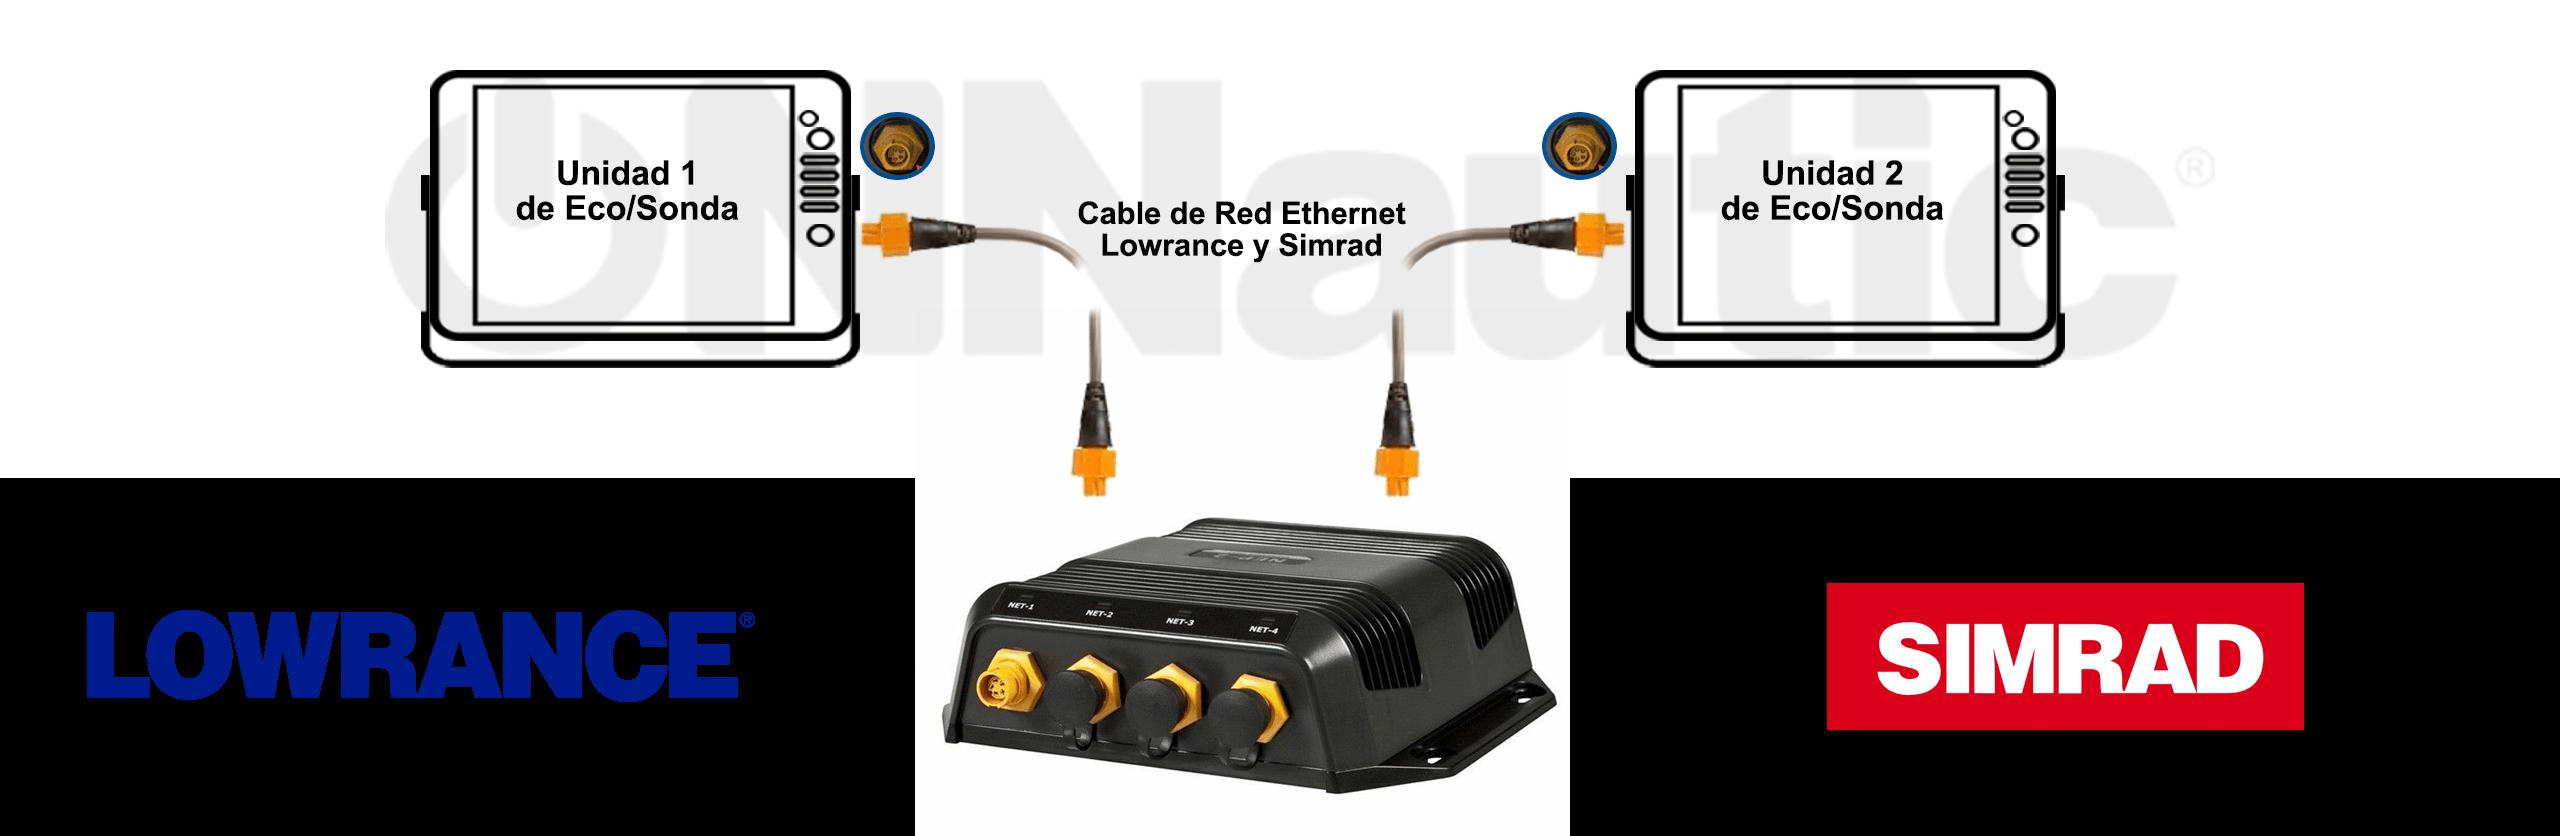 Diagrama Lowrance Simrad Ethernet